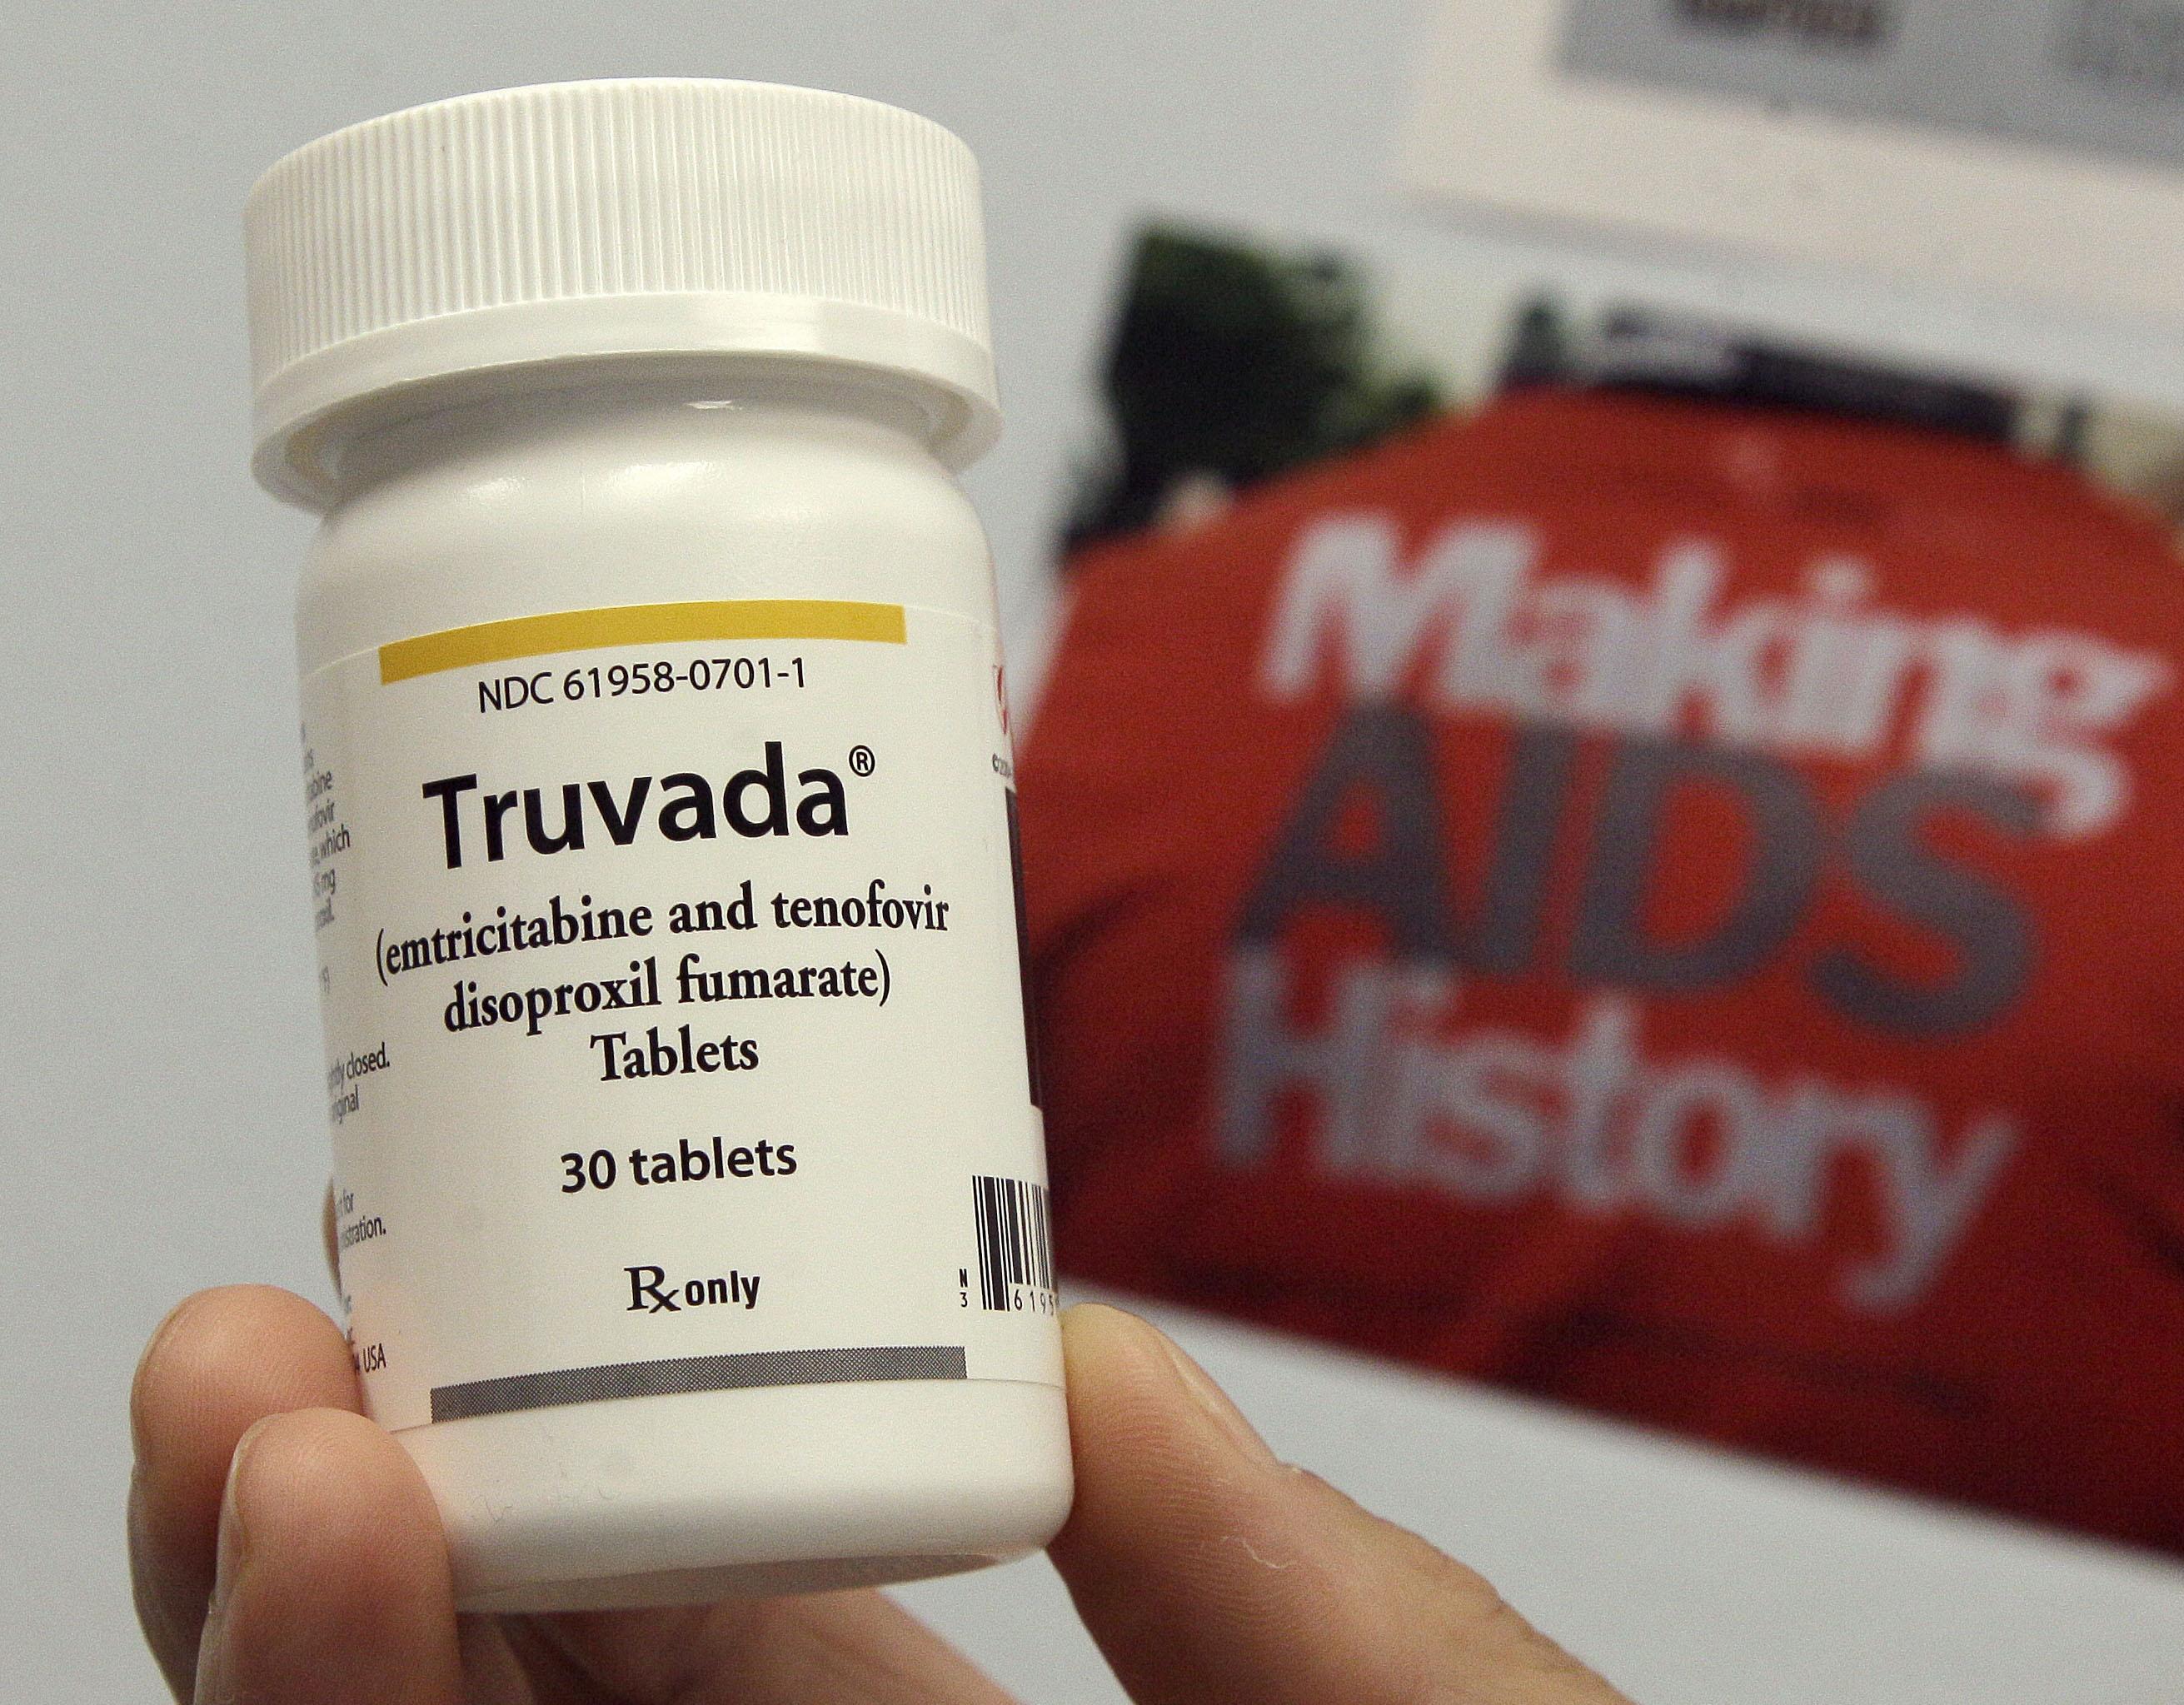 Find Black HIV Dates